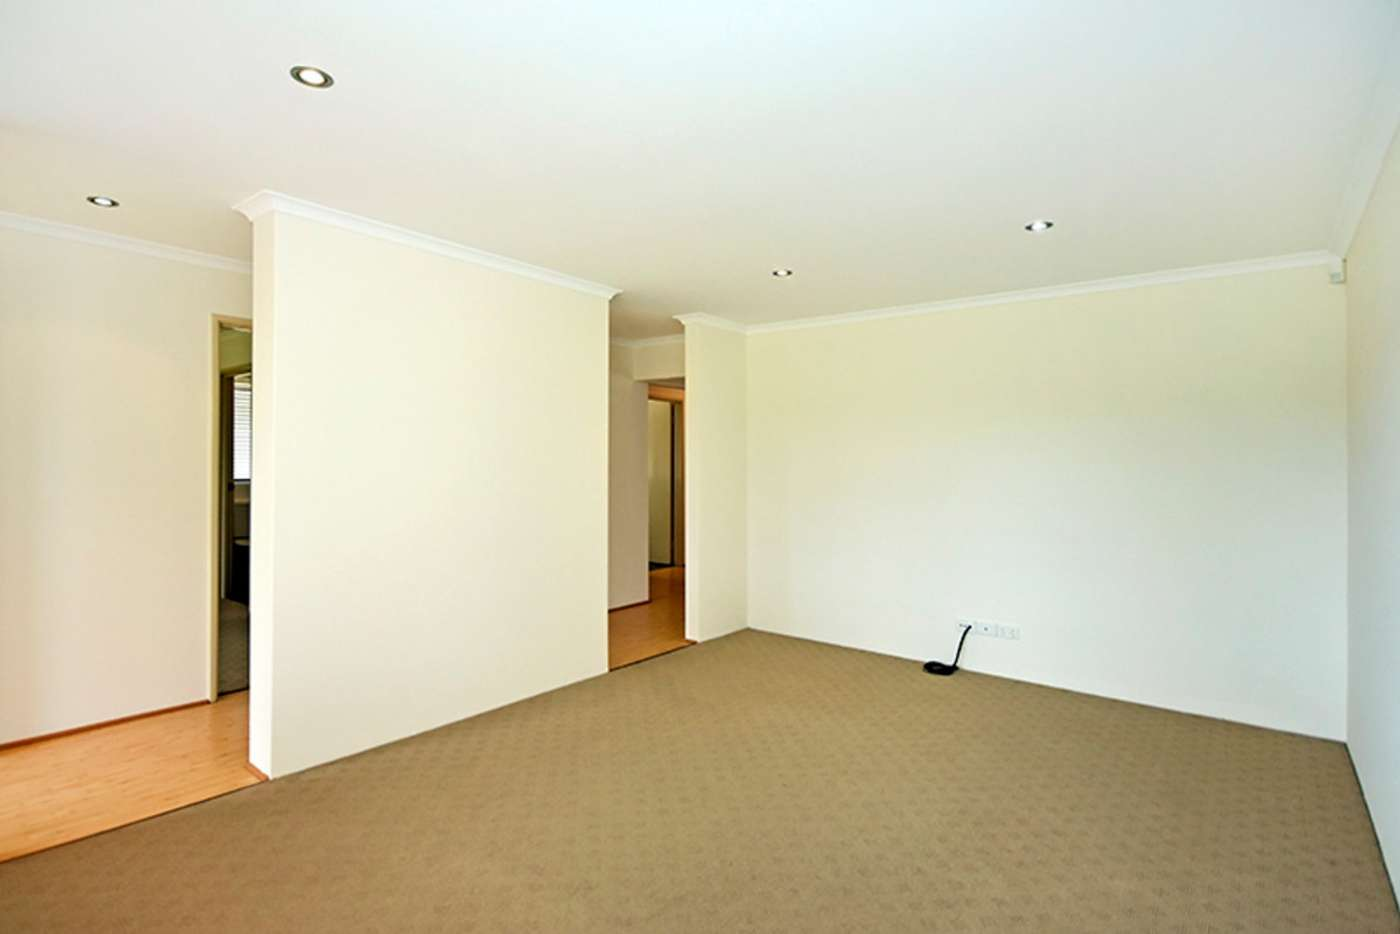 Seventh view of Homely house listing, 24 Barossa Gardens, Caversham WA 6055